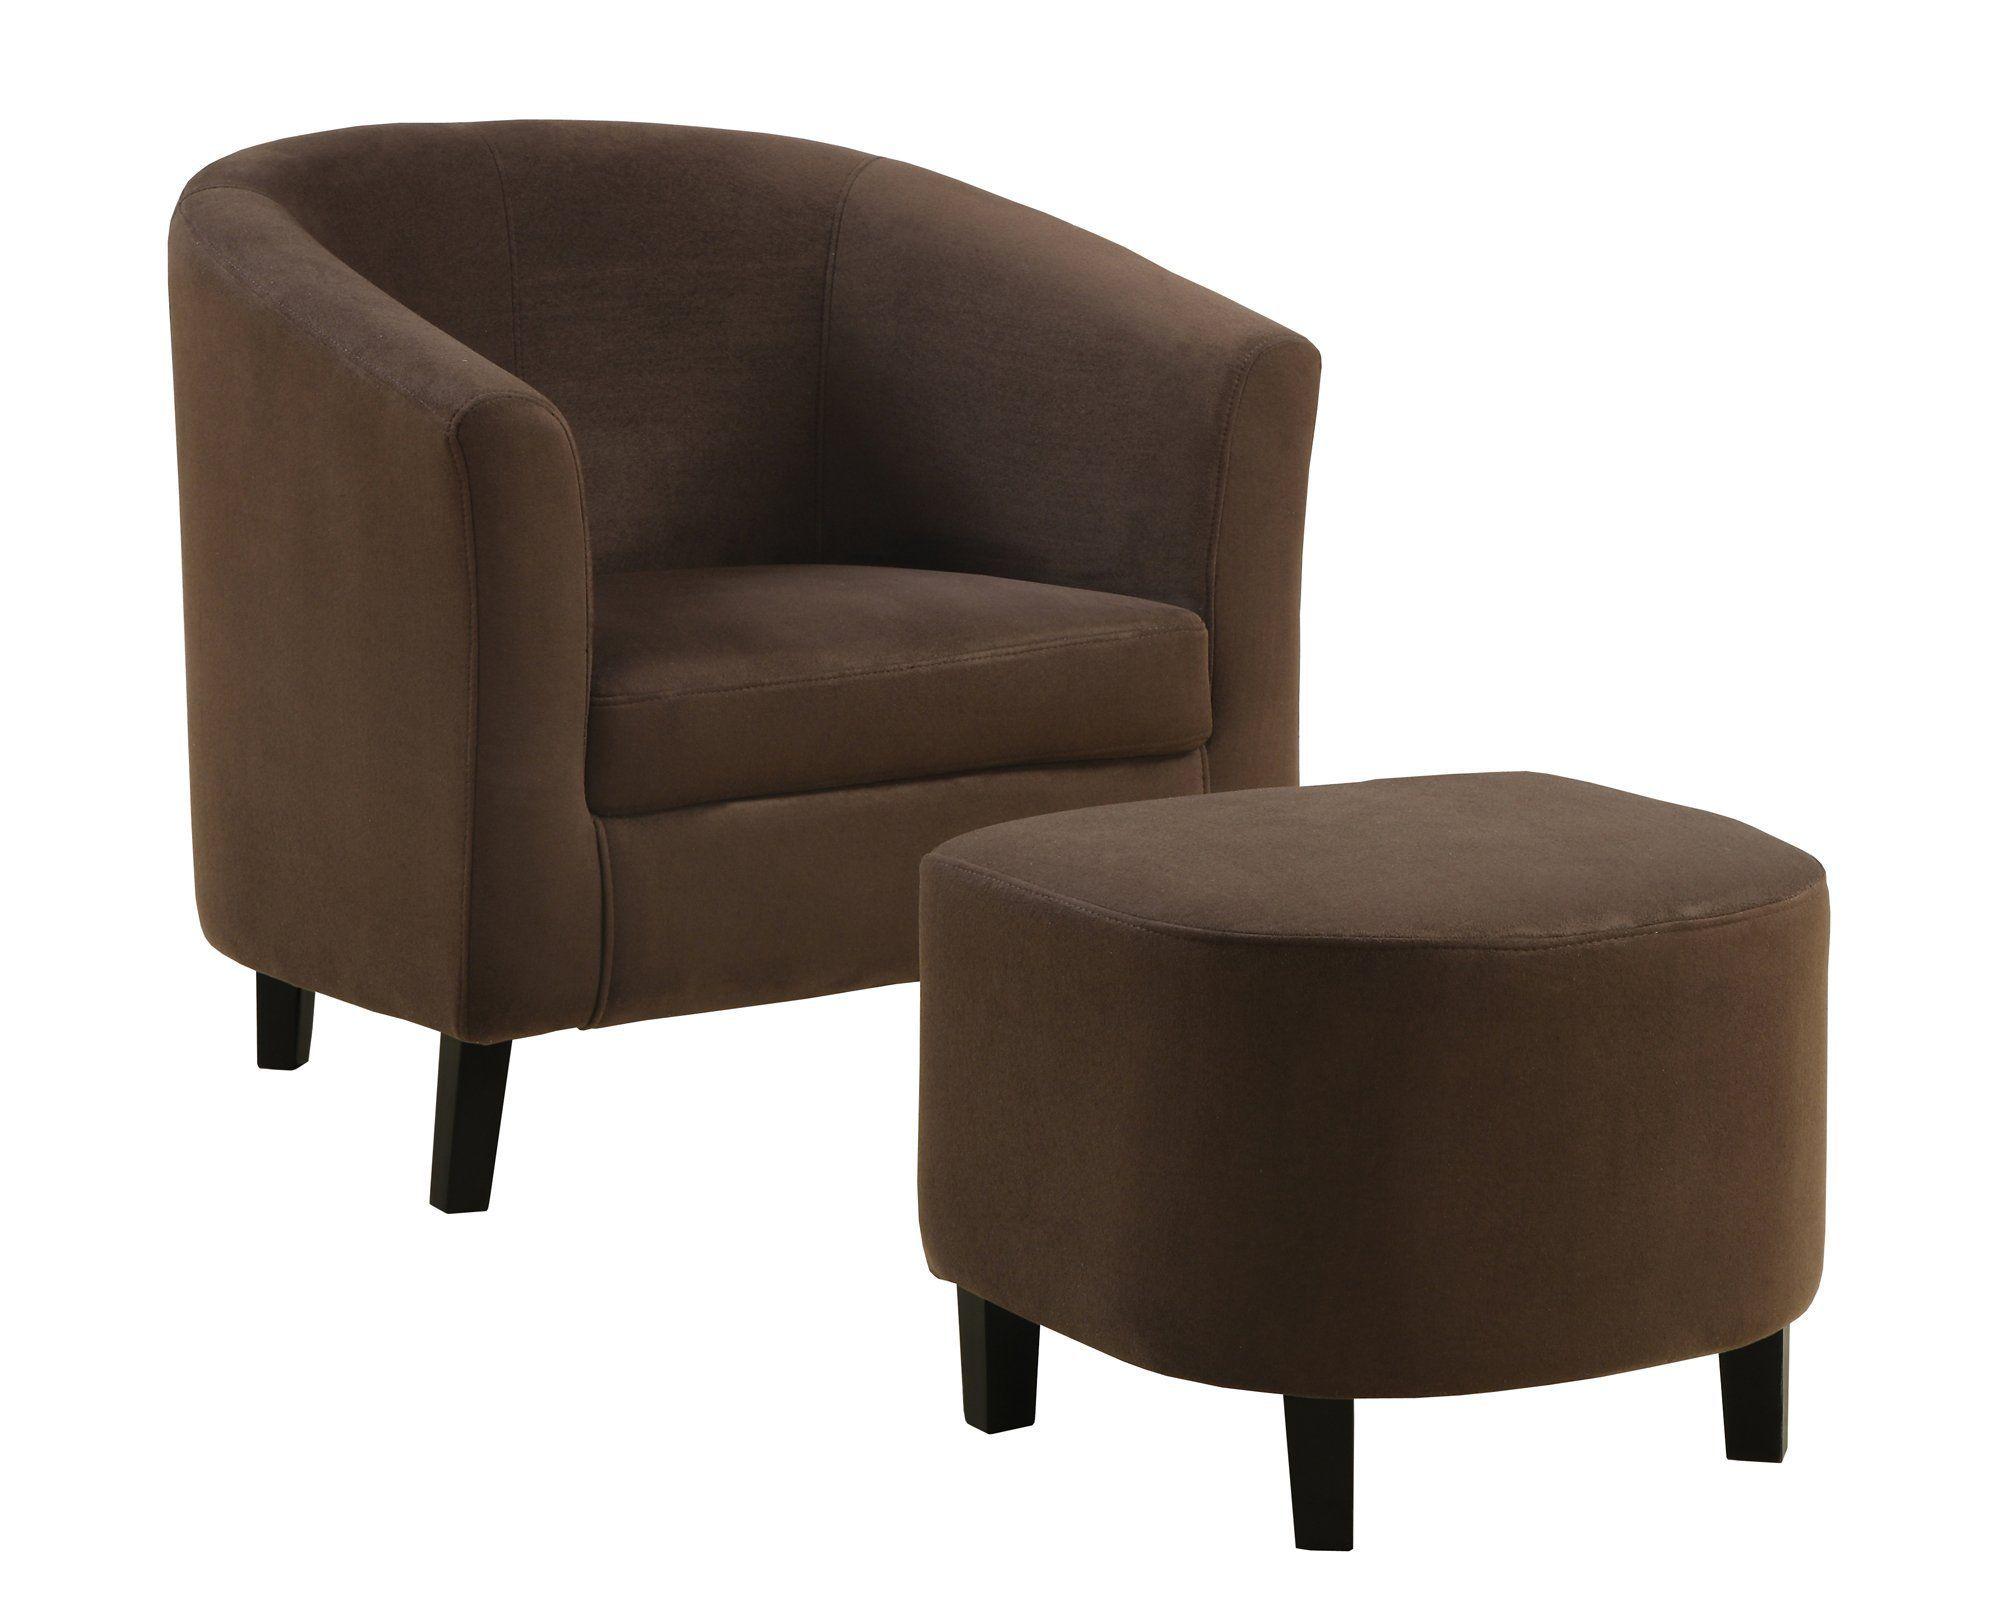 Accent chair 2pcs set chocolate microfiber fabric